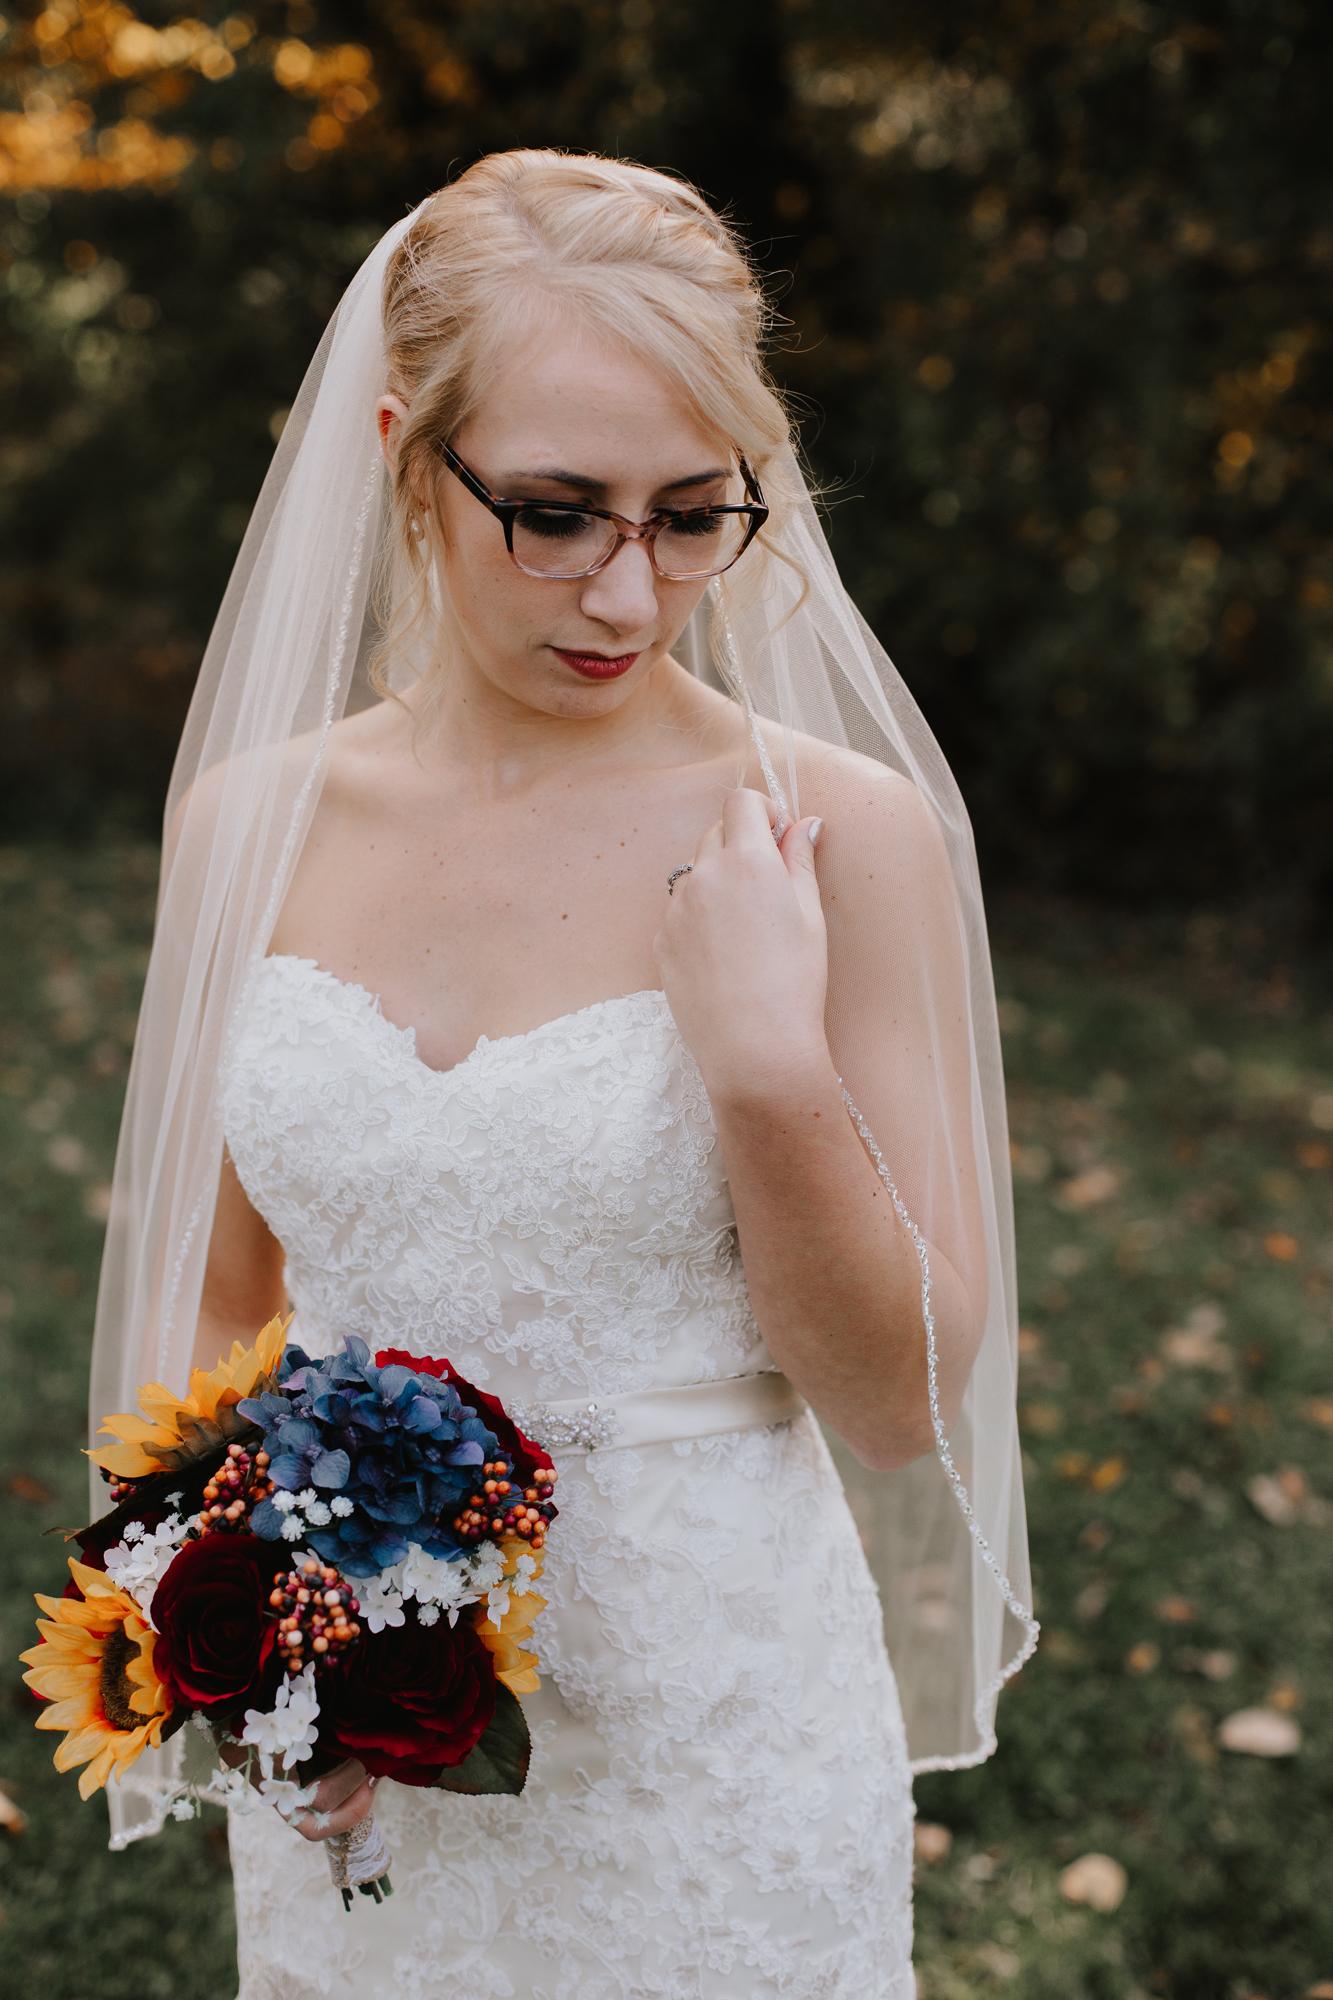 muncy-pa-beiber-drive-wedding-day-portrait